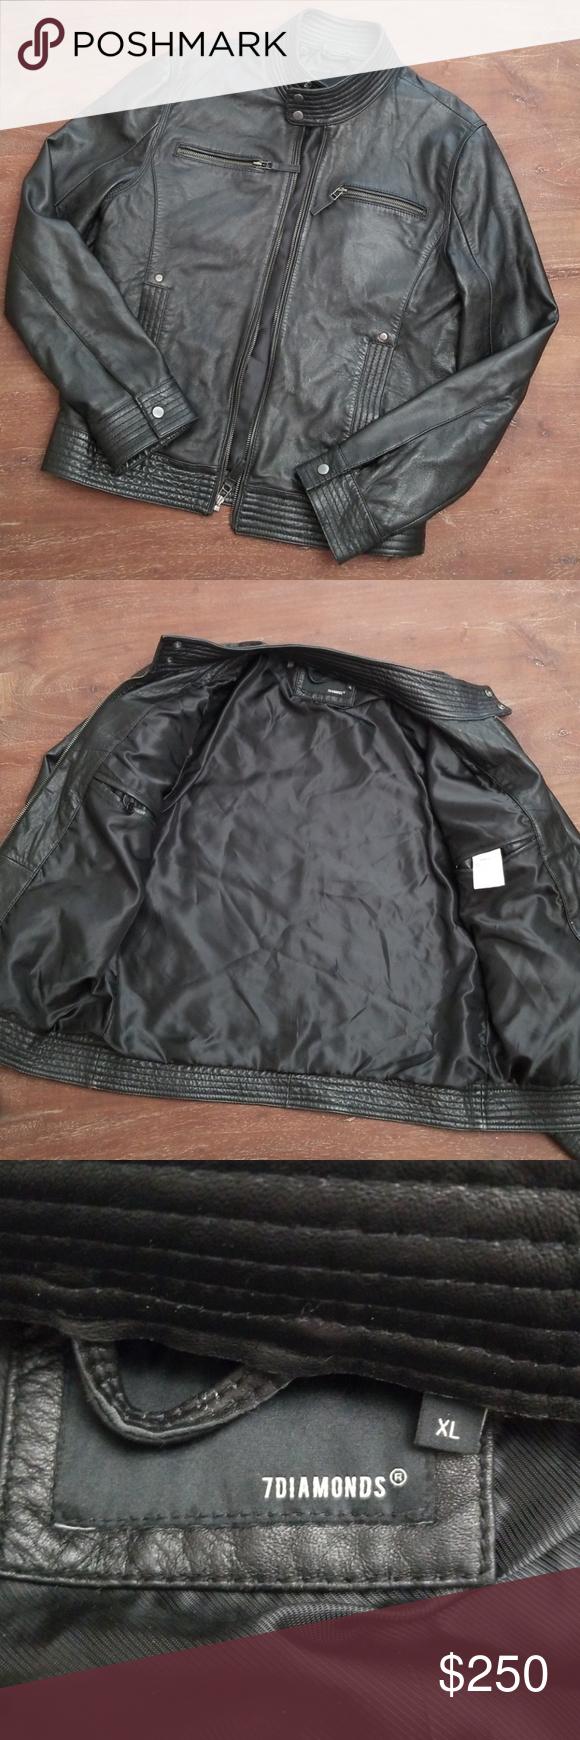 b47ff14d6 Gone tmrw 7 Diamonds Leather Moto Jacket Worn twice Slim fit. More ...